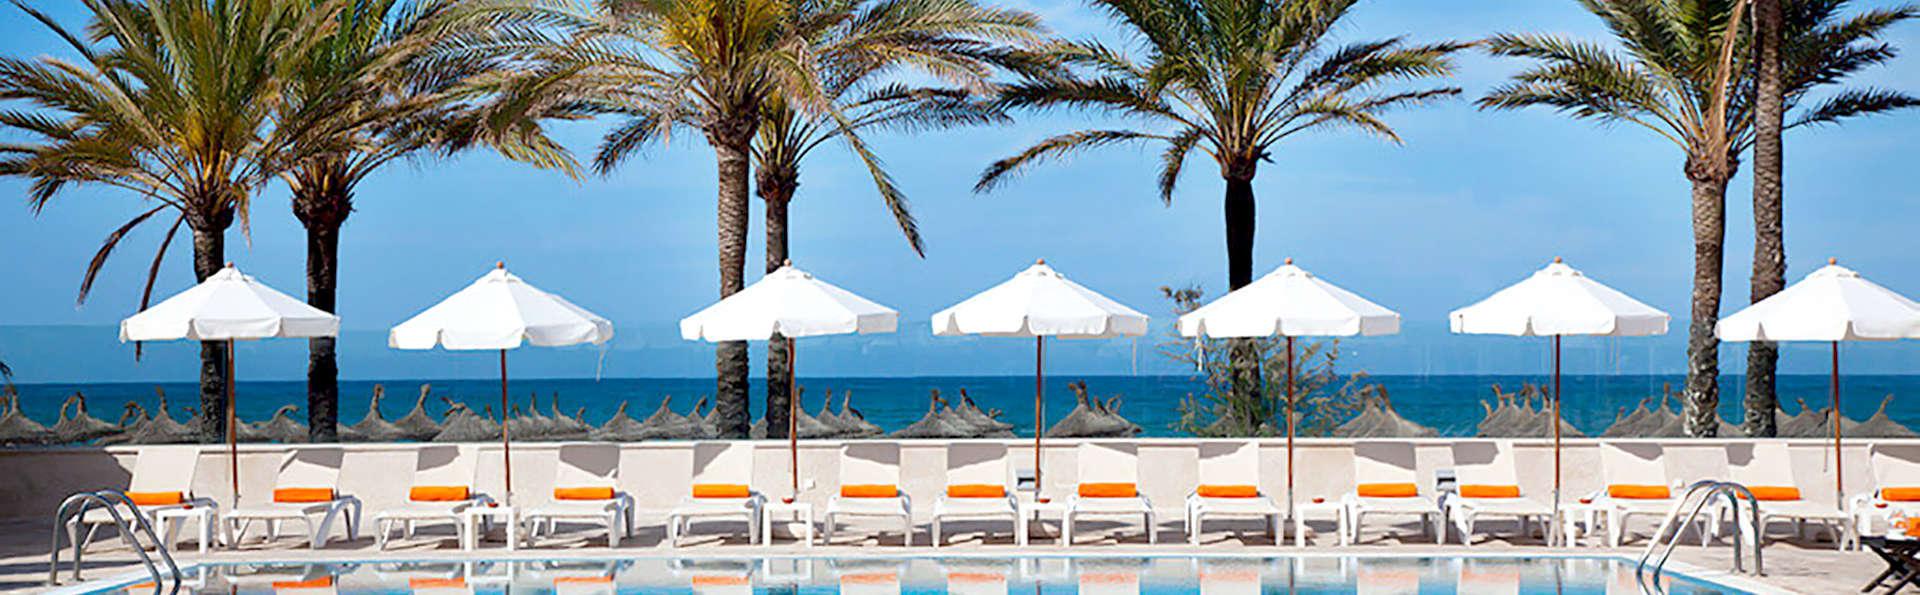 Admirez la vue sur la mer dans un hôtel de Majorque